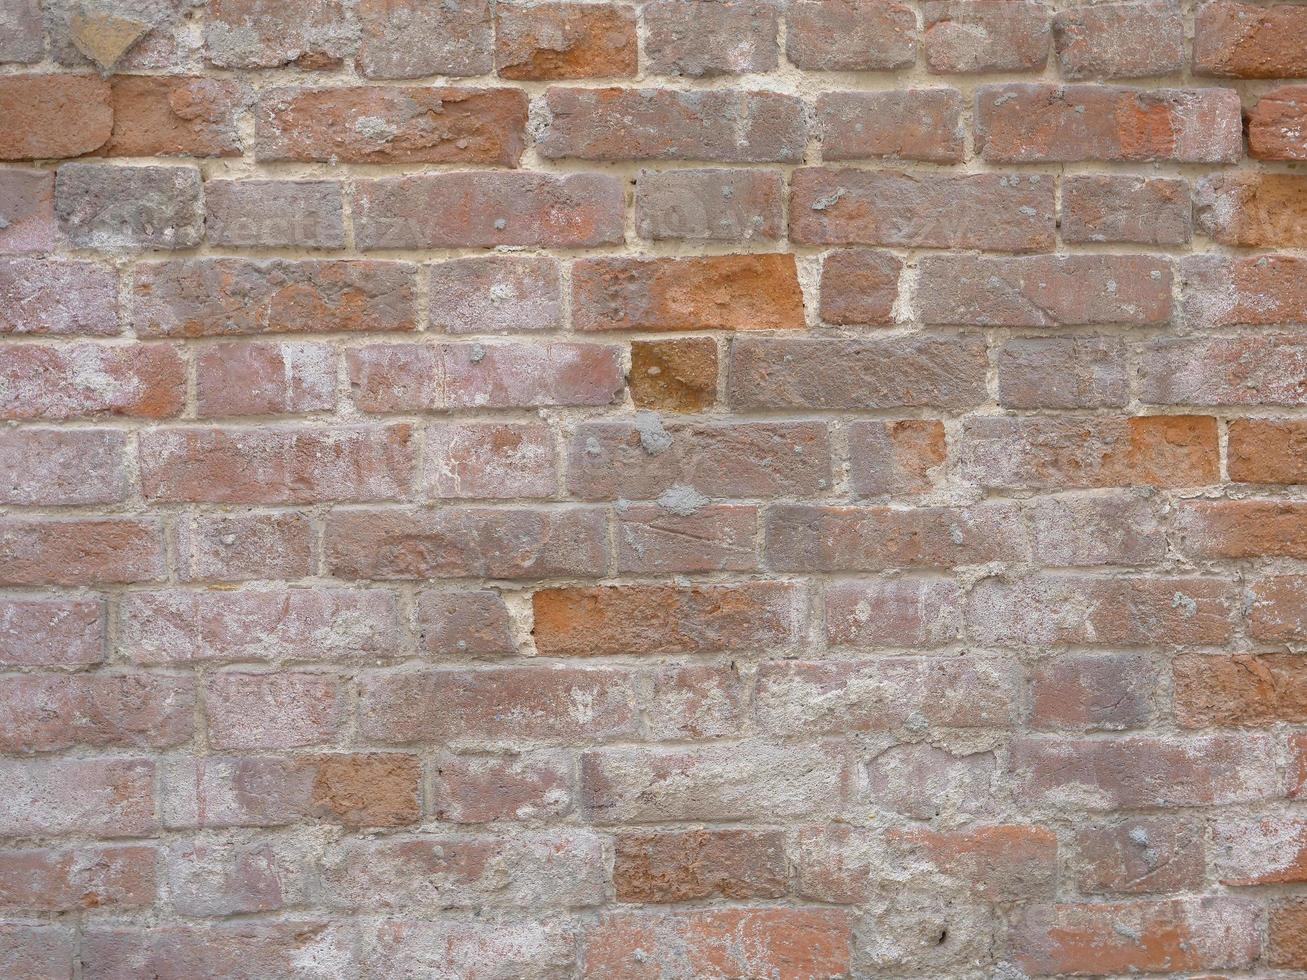 Retro vintage brick old wall texture background image photo